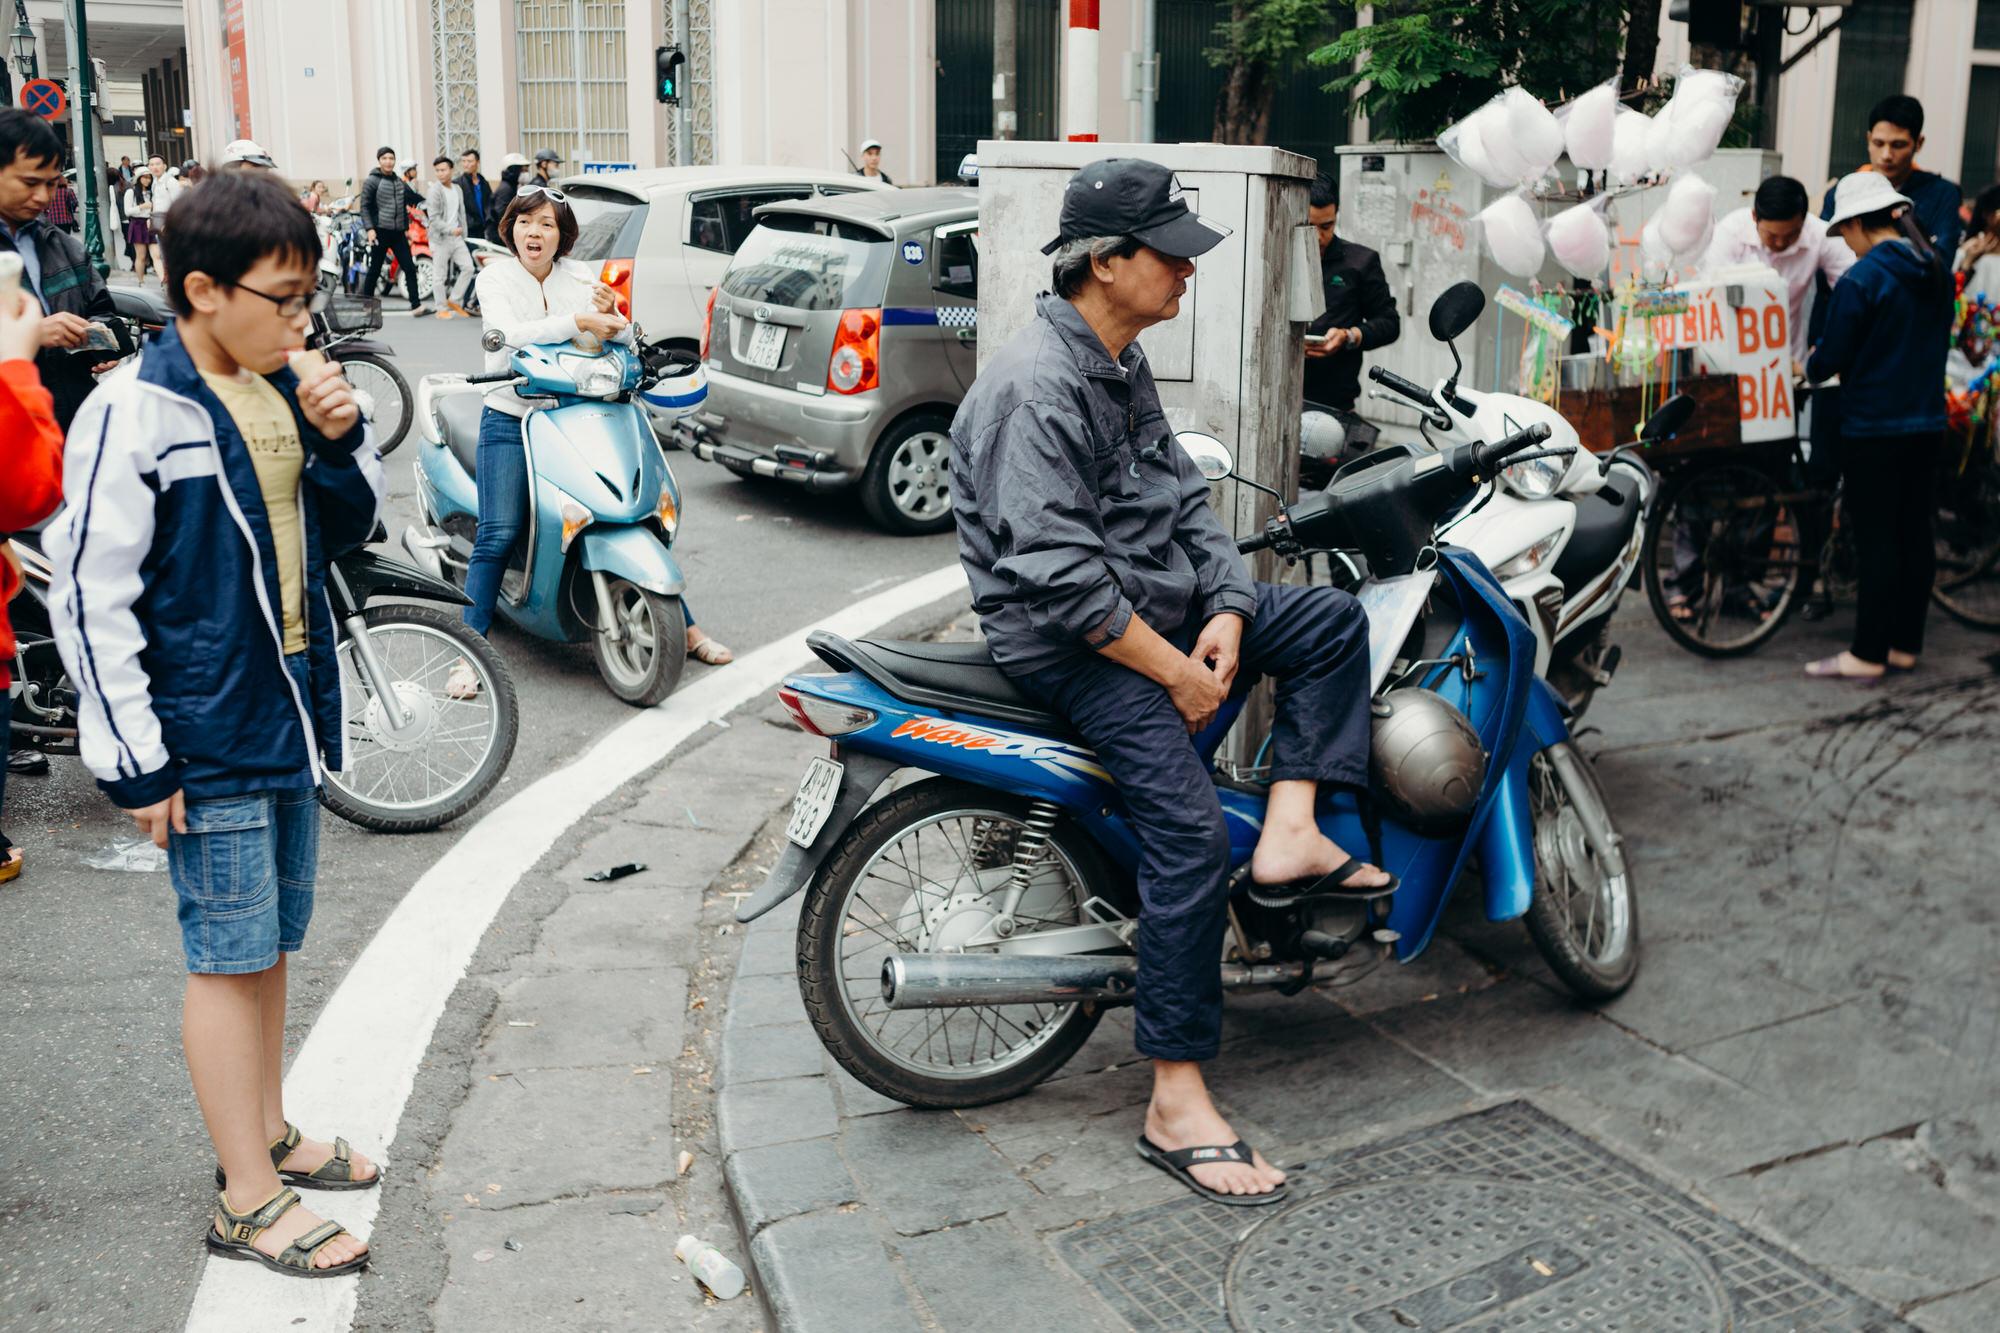 hanoivietnamtravelblog-9614-1.jpg